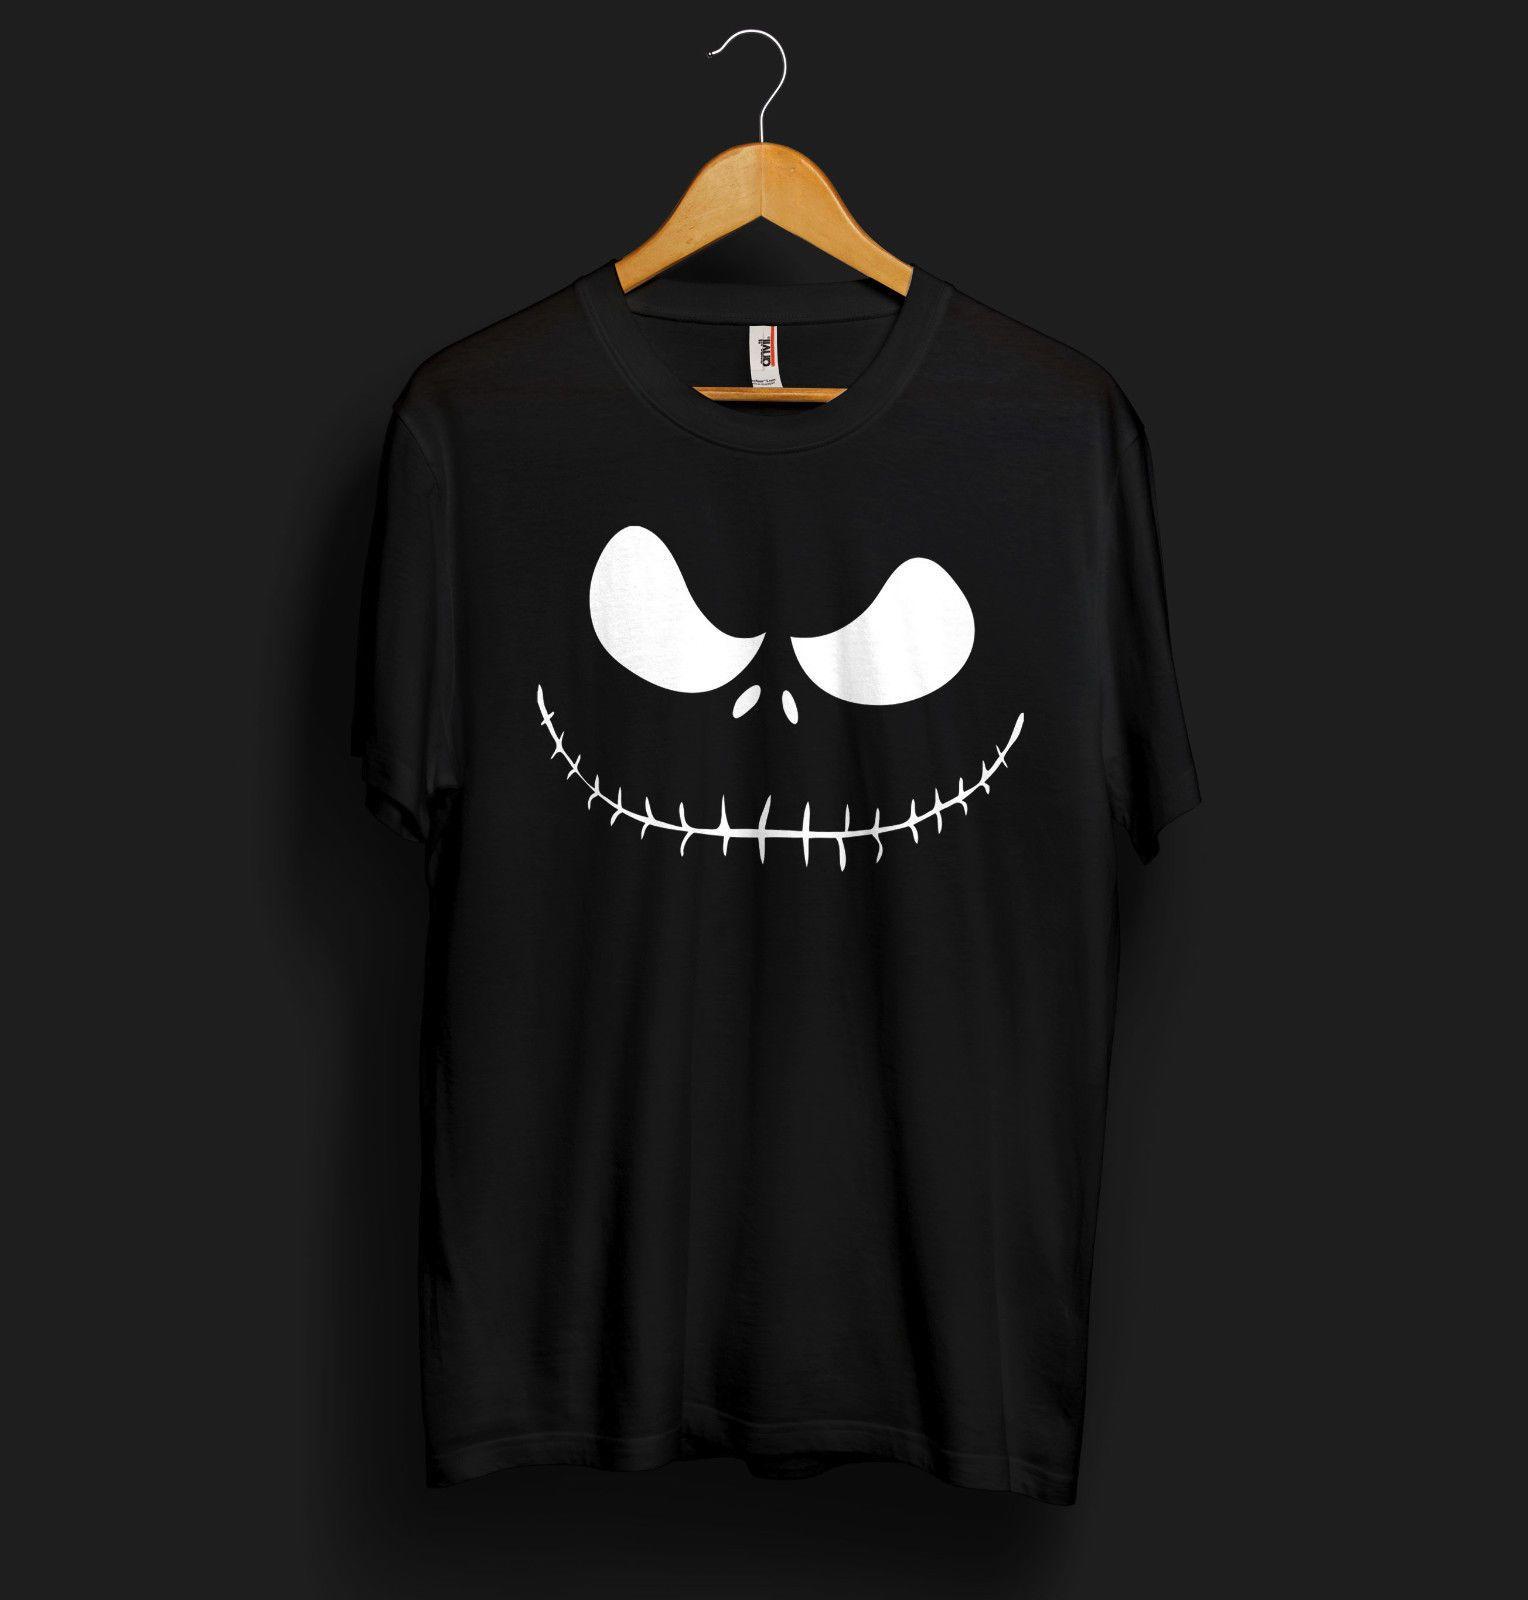 Halloween Jack Skellington Scary.Jack Skellington T Shirt Face Head Pumpkin Halloween Scary Monster Kids Costumefunny Free Shipping Casual Tee